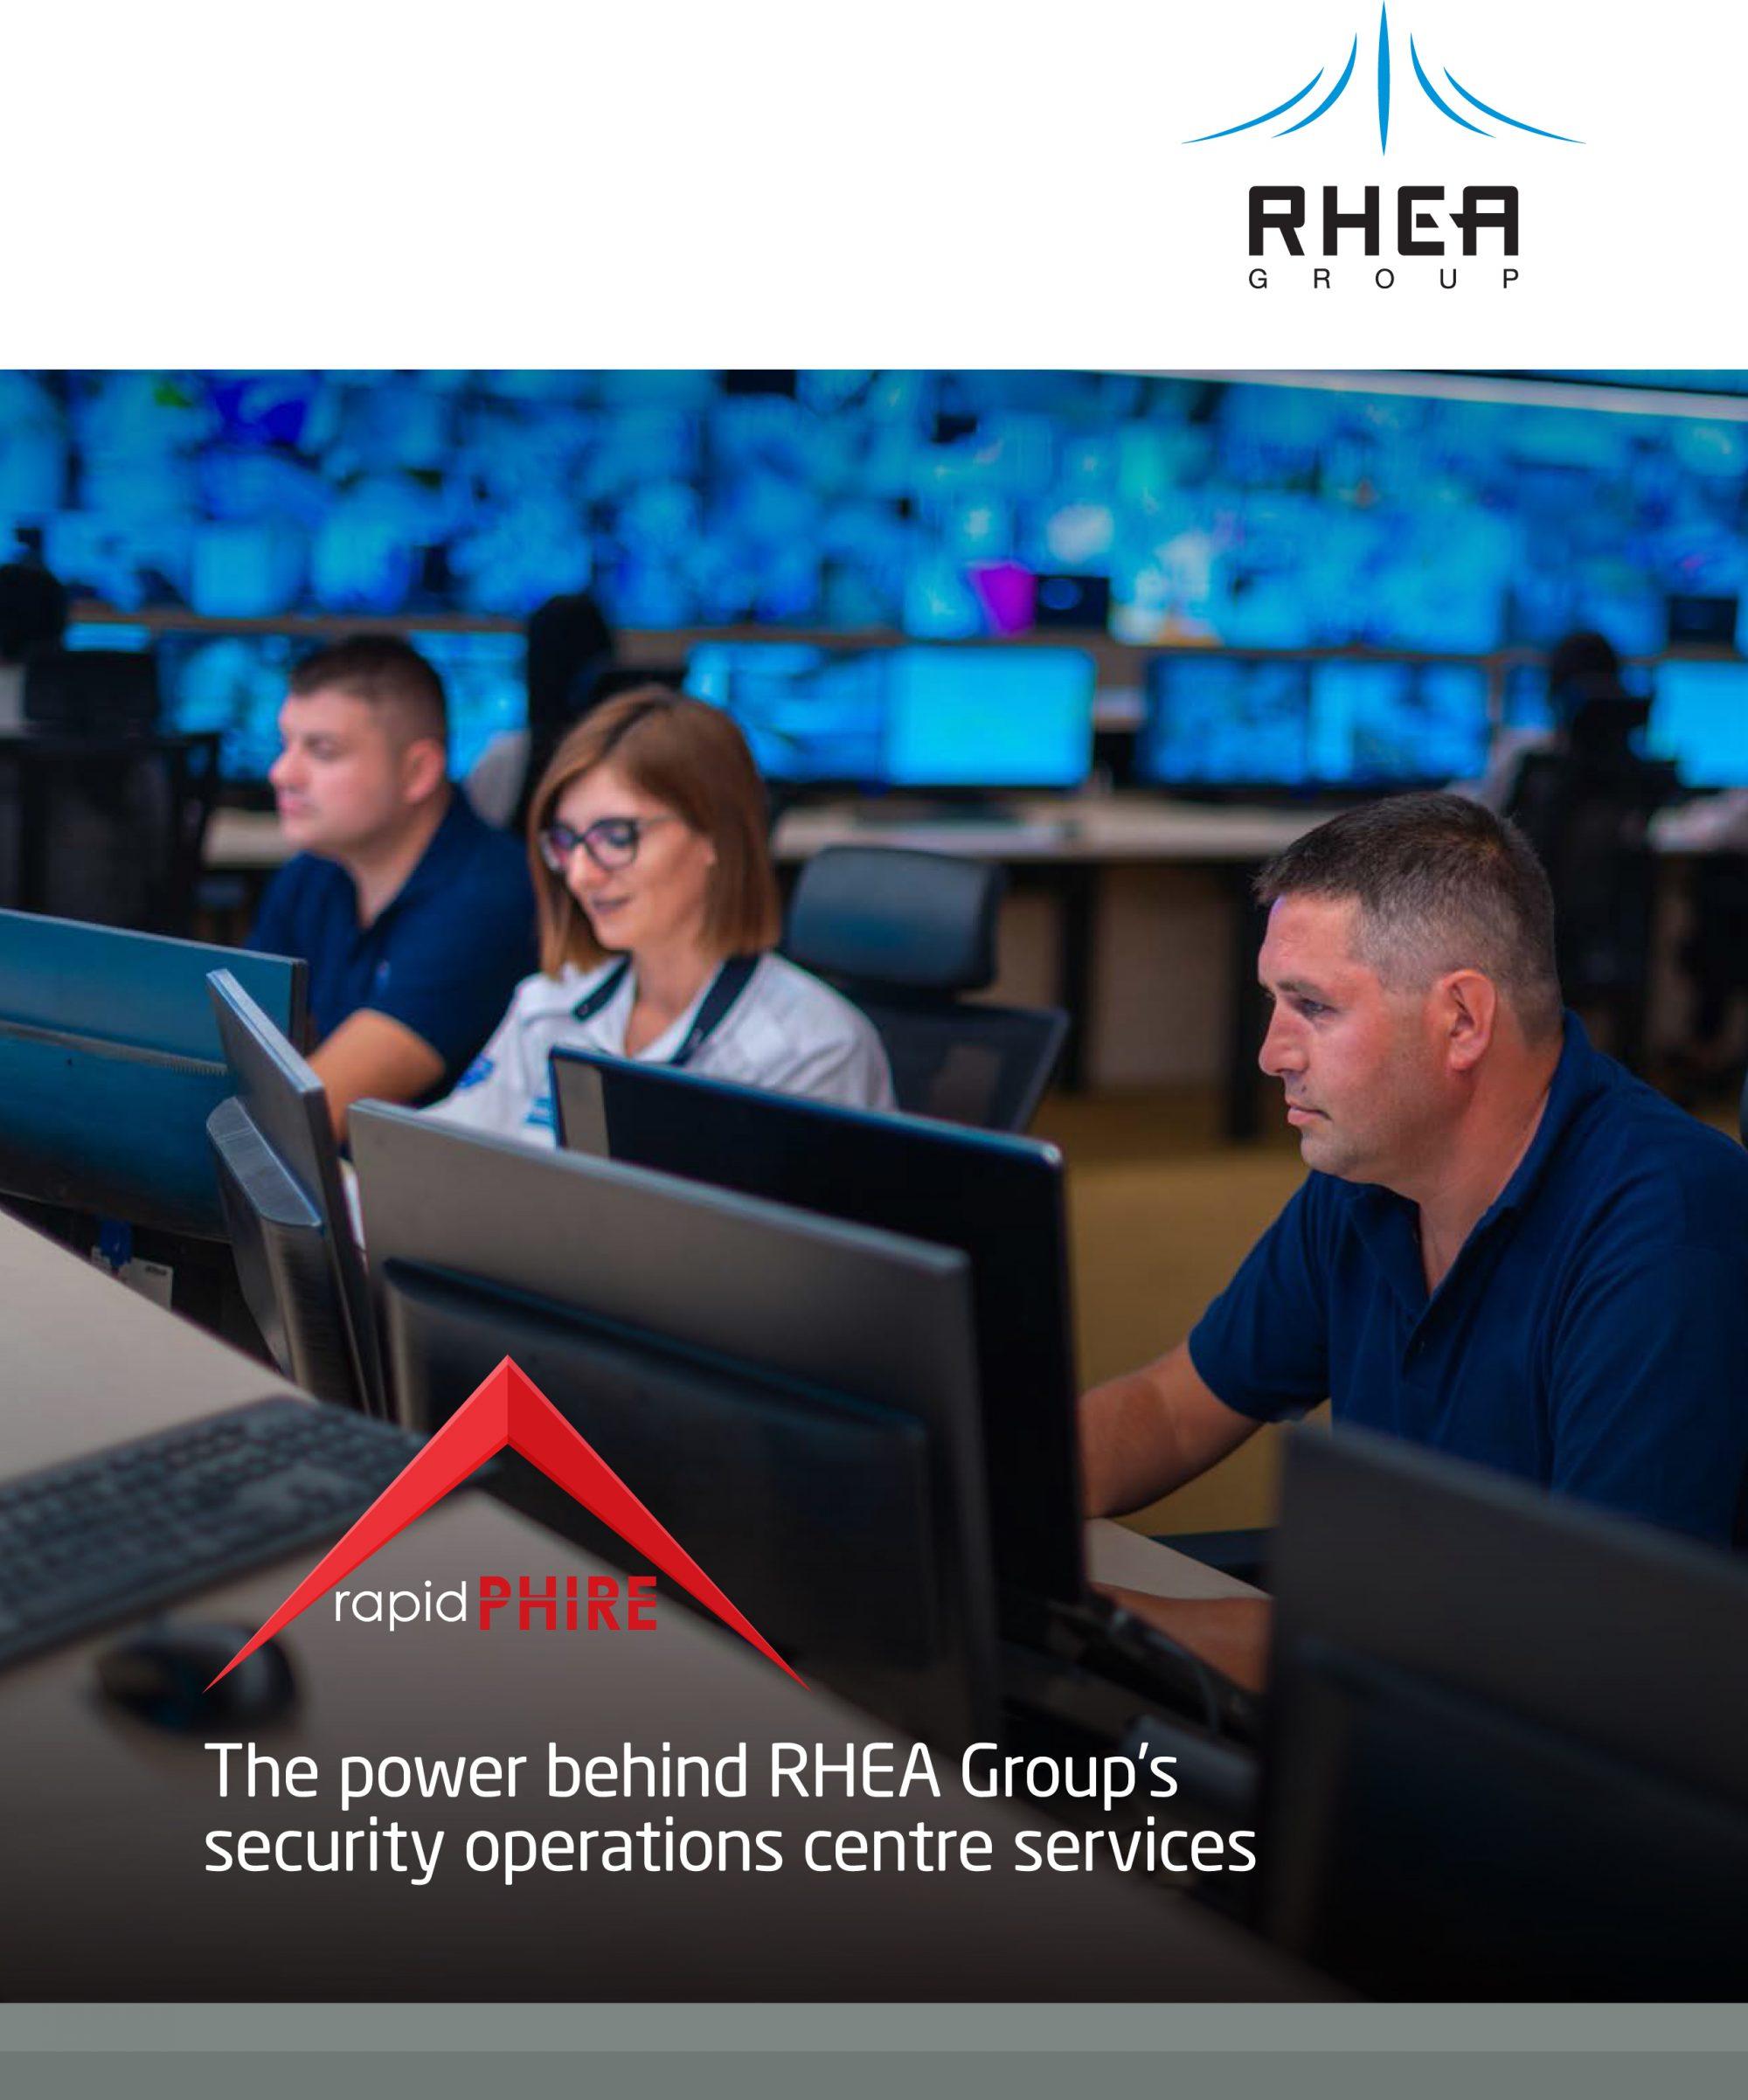 RHEA Group rapidPHIRE brochure cover